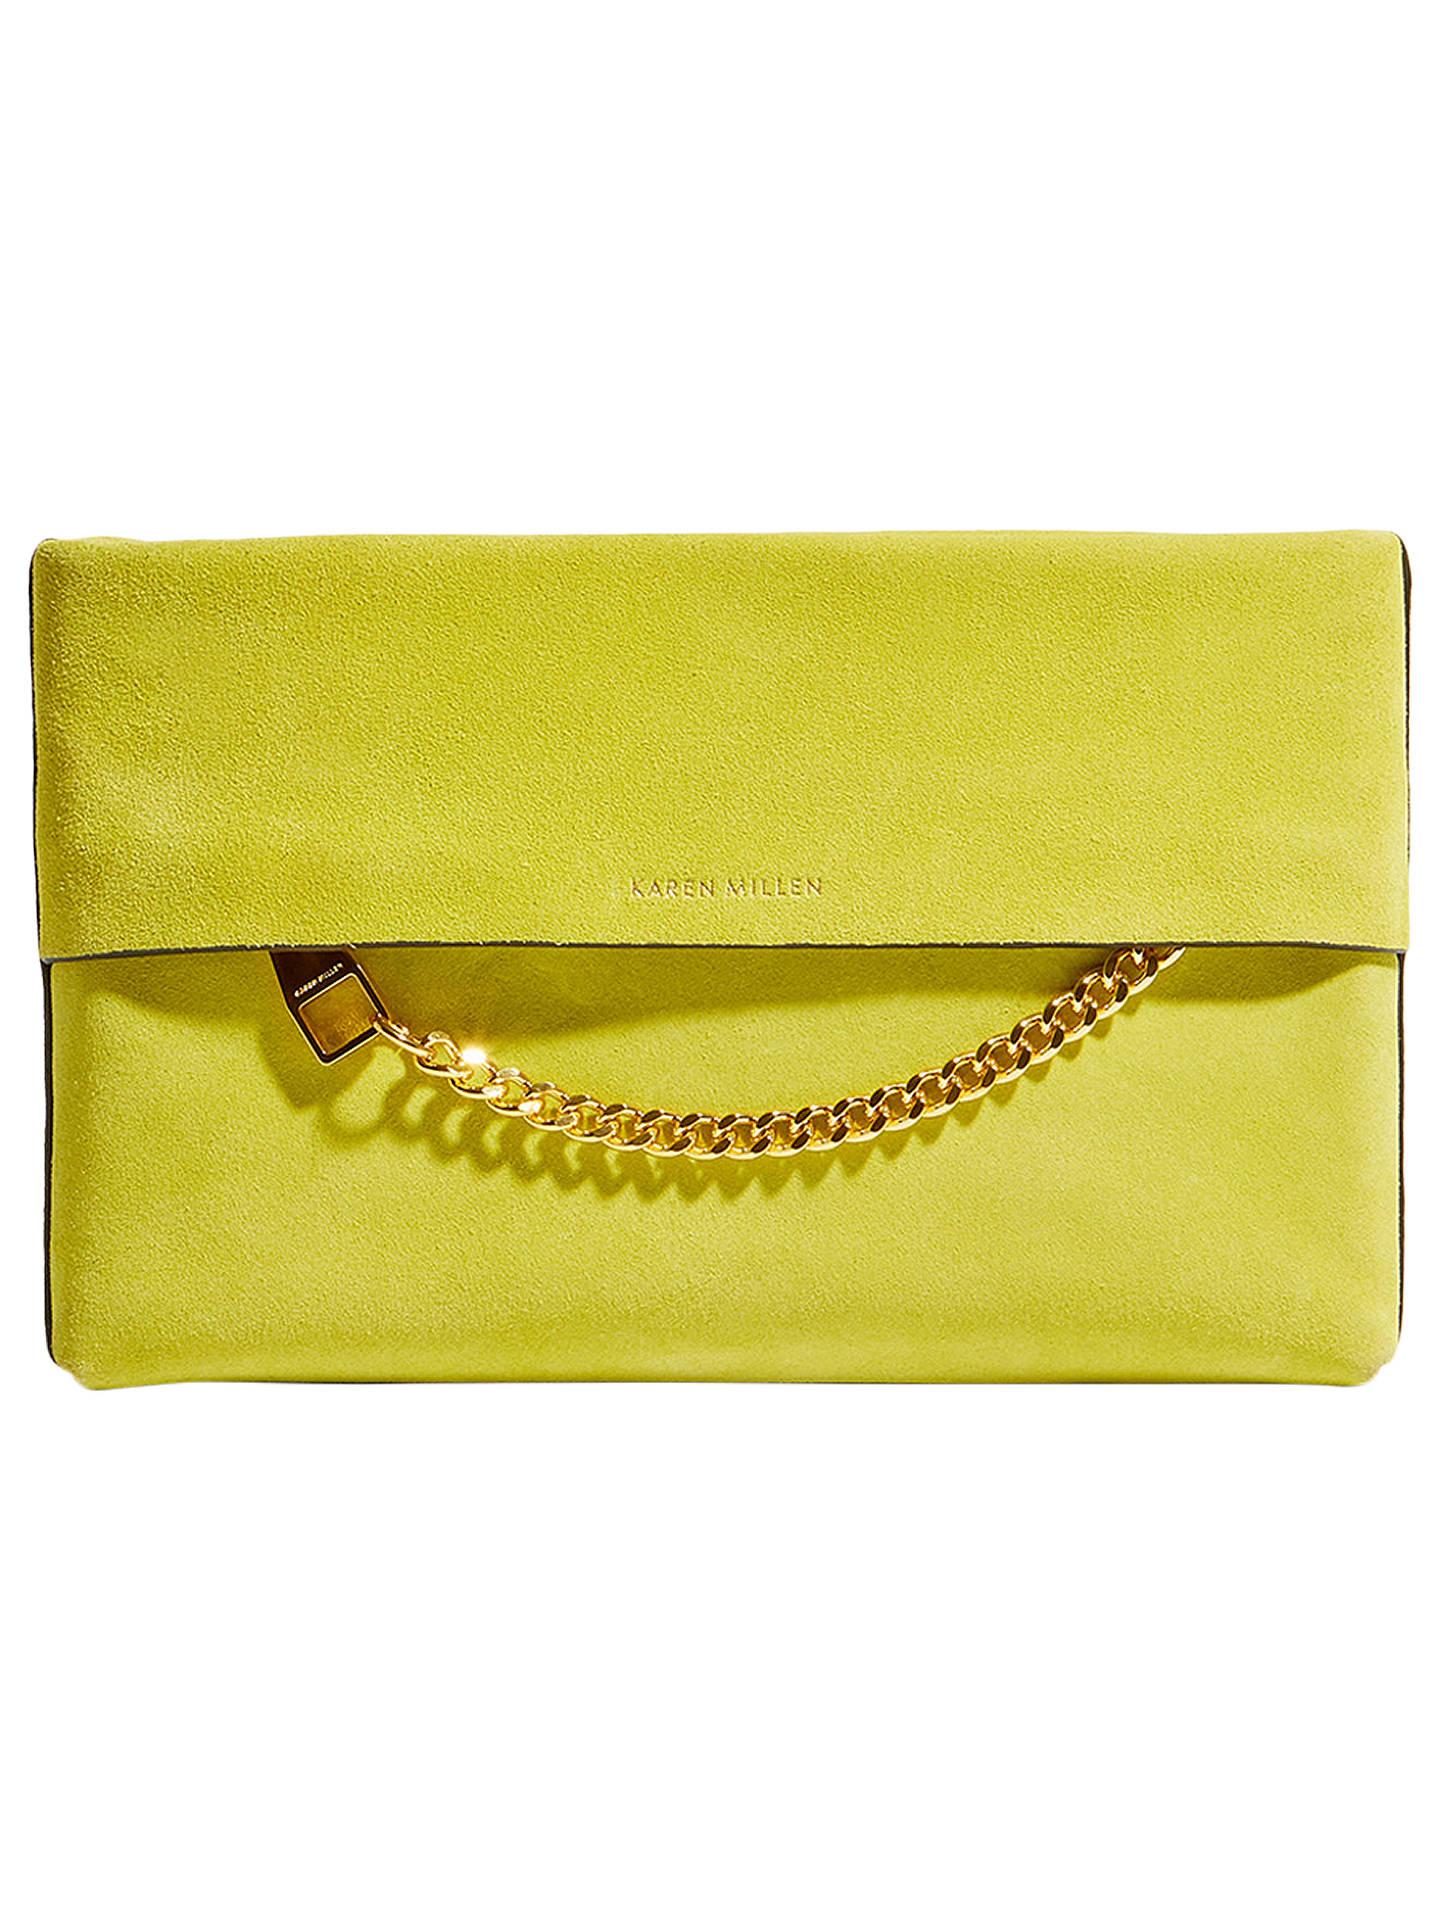 984e963c237d Buy Karen Millen Leather Chain Zip Clutch Bag, Lime Leather Online at  johnlewis.com ...